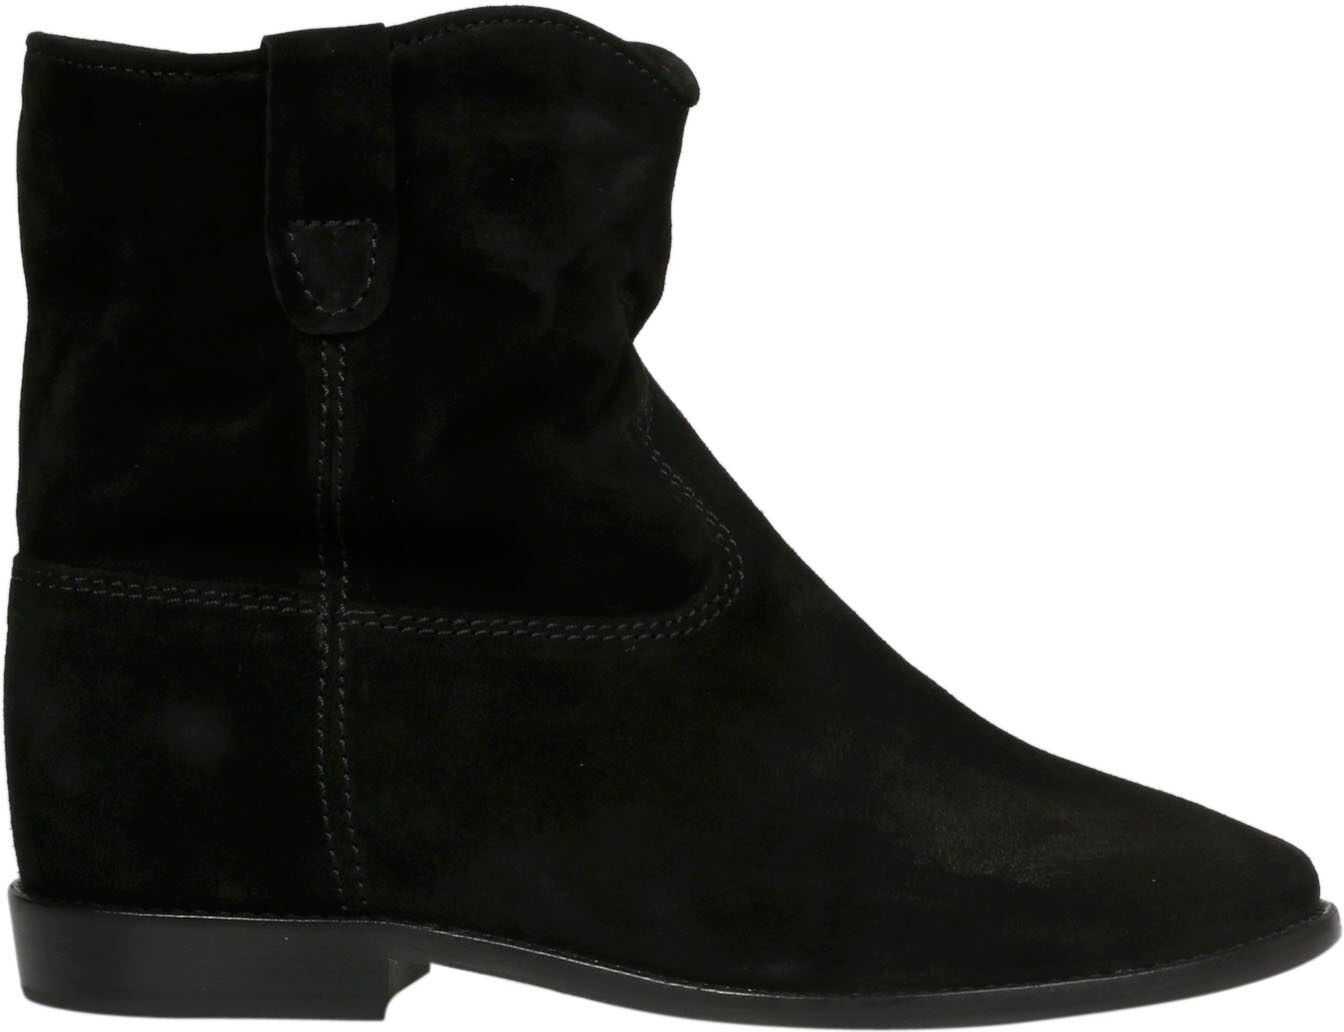 Isabel Marant Suede Ankle Boots BLACK